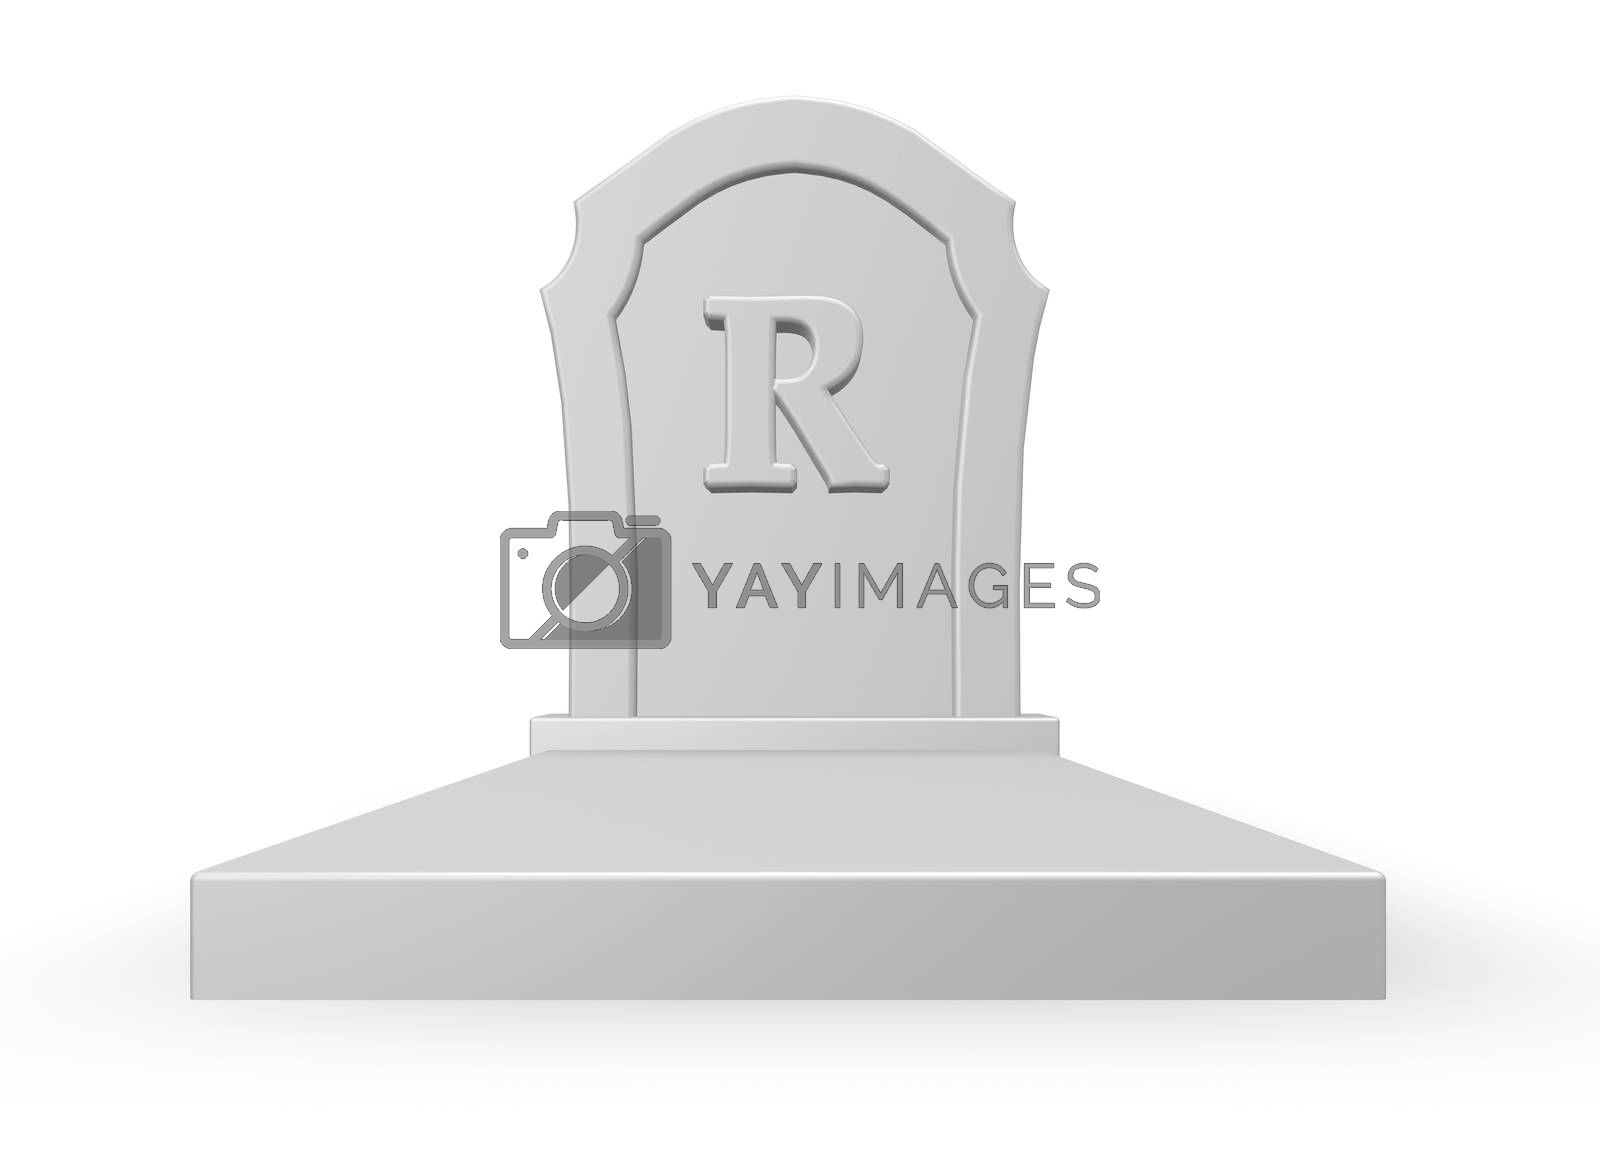 gravestone with uppercase letter r on white background - 3d illustration